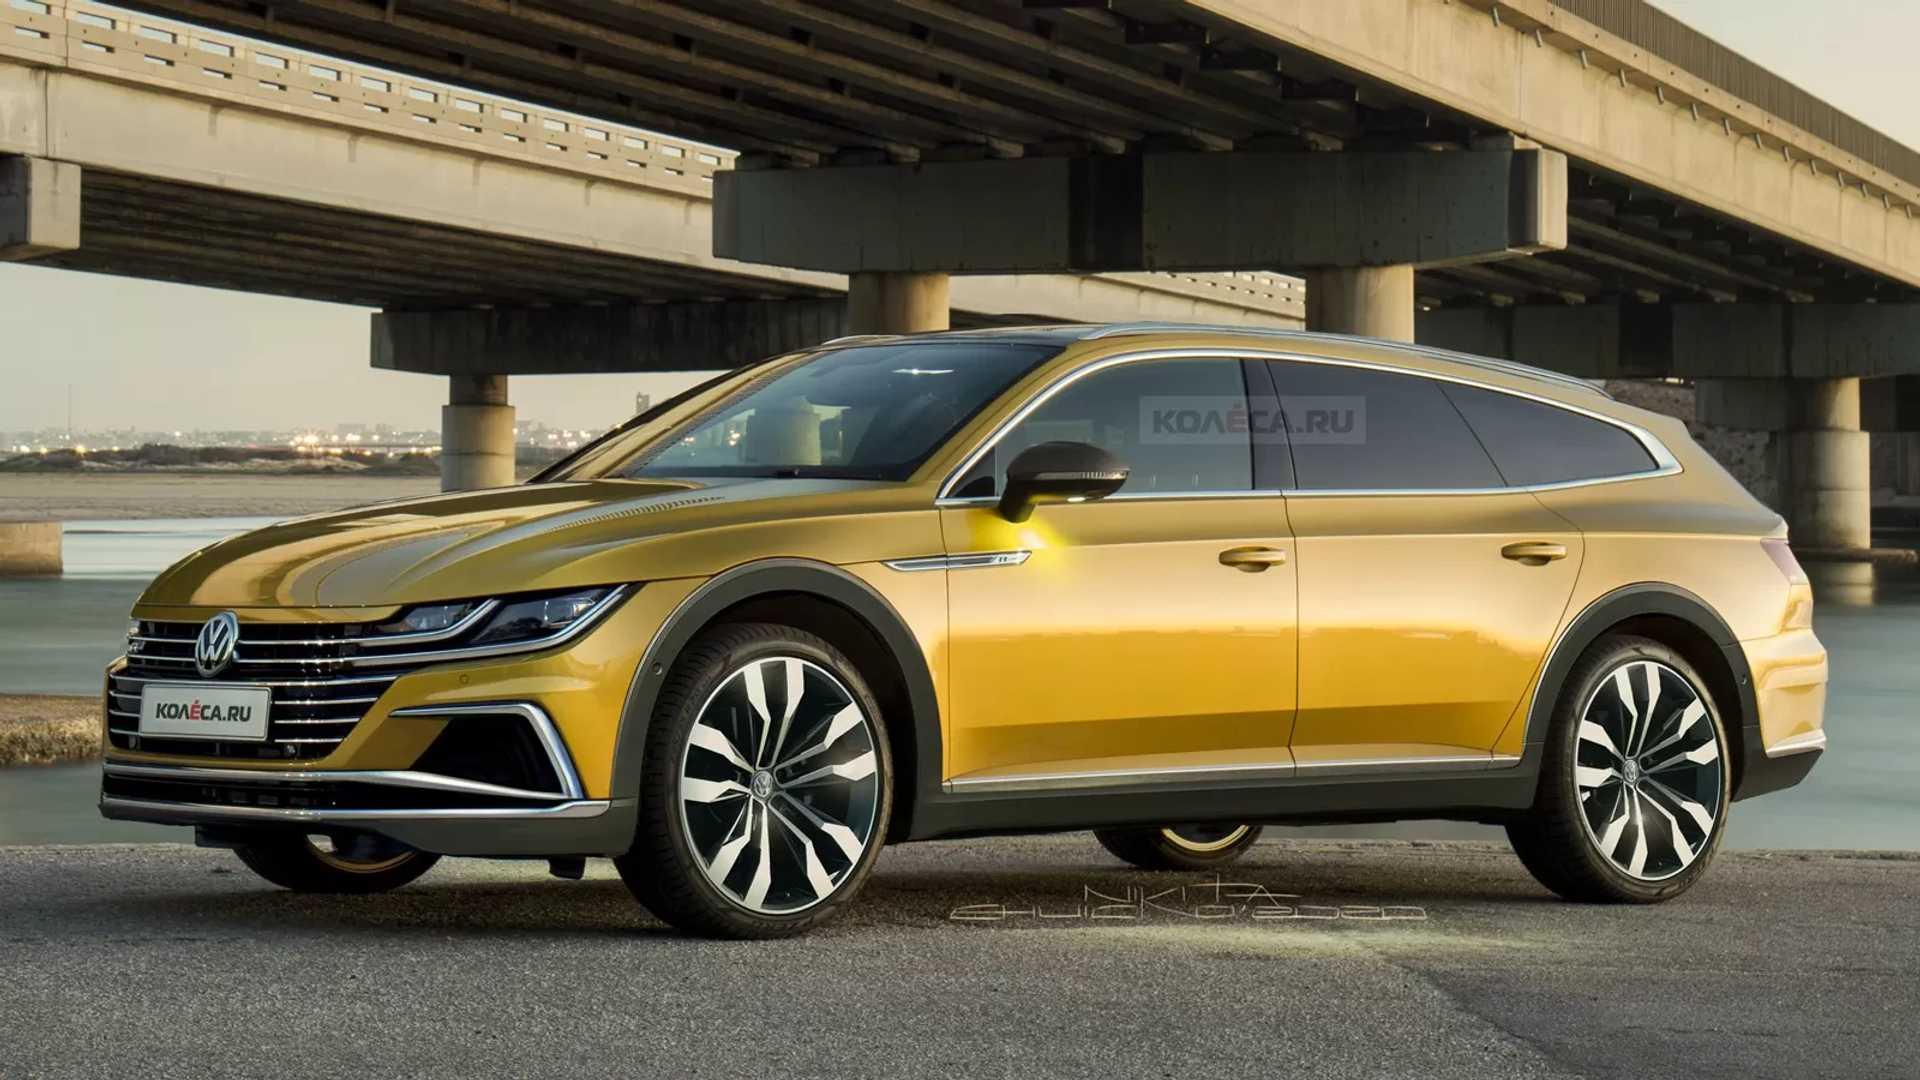 Lifted Volkswagen Arteon Shooting Brake Looks Like An Expensive Subaru Rival Autoevolution